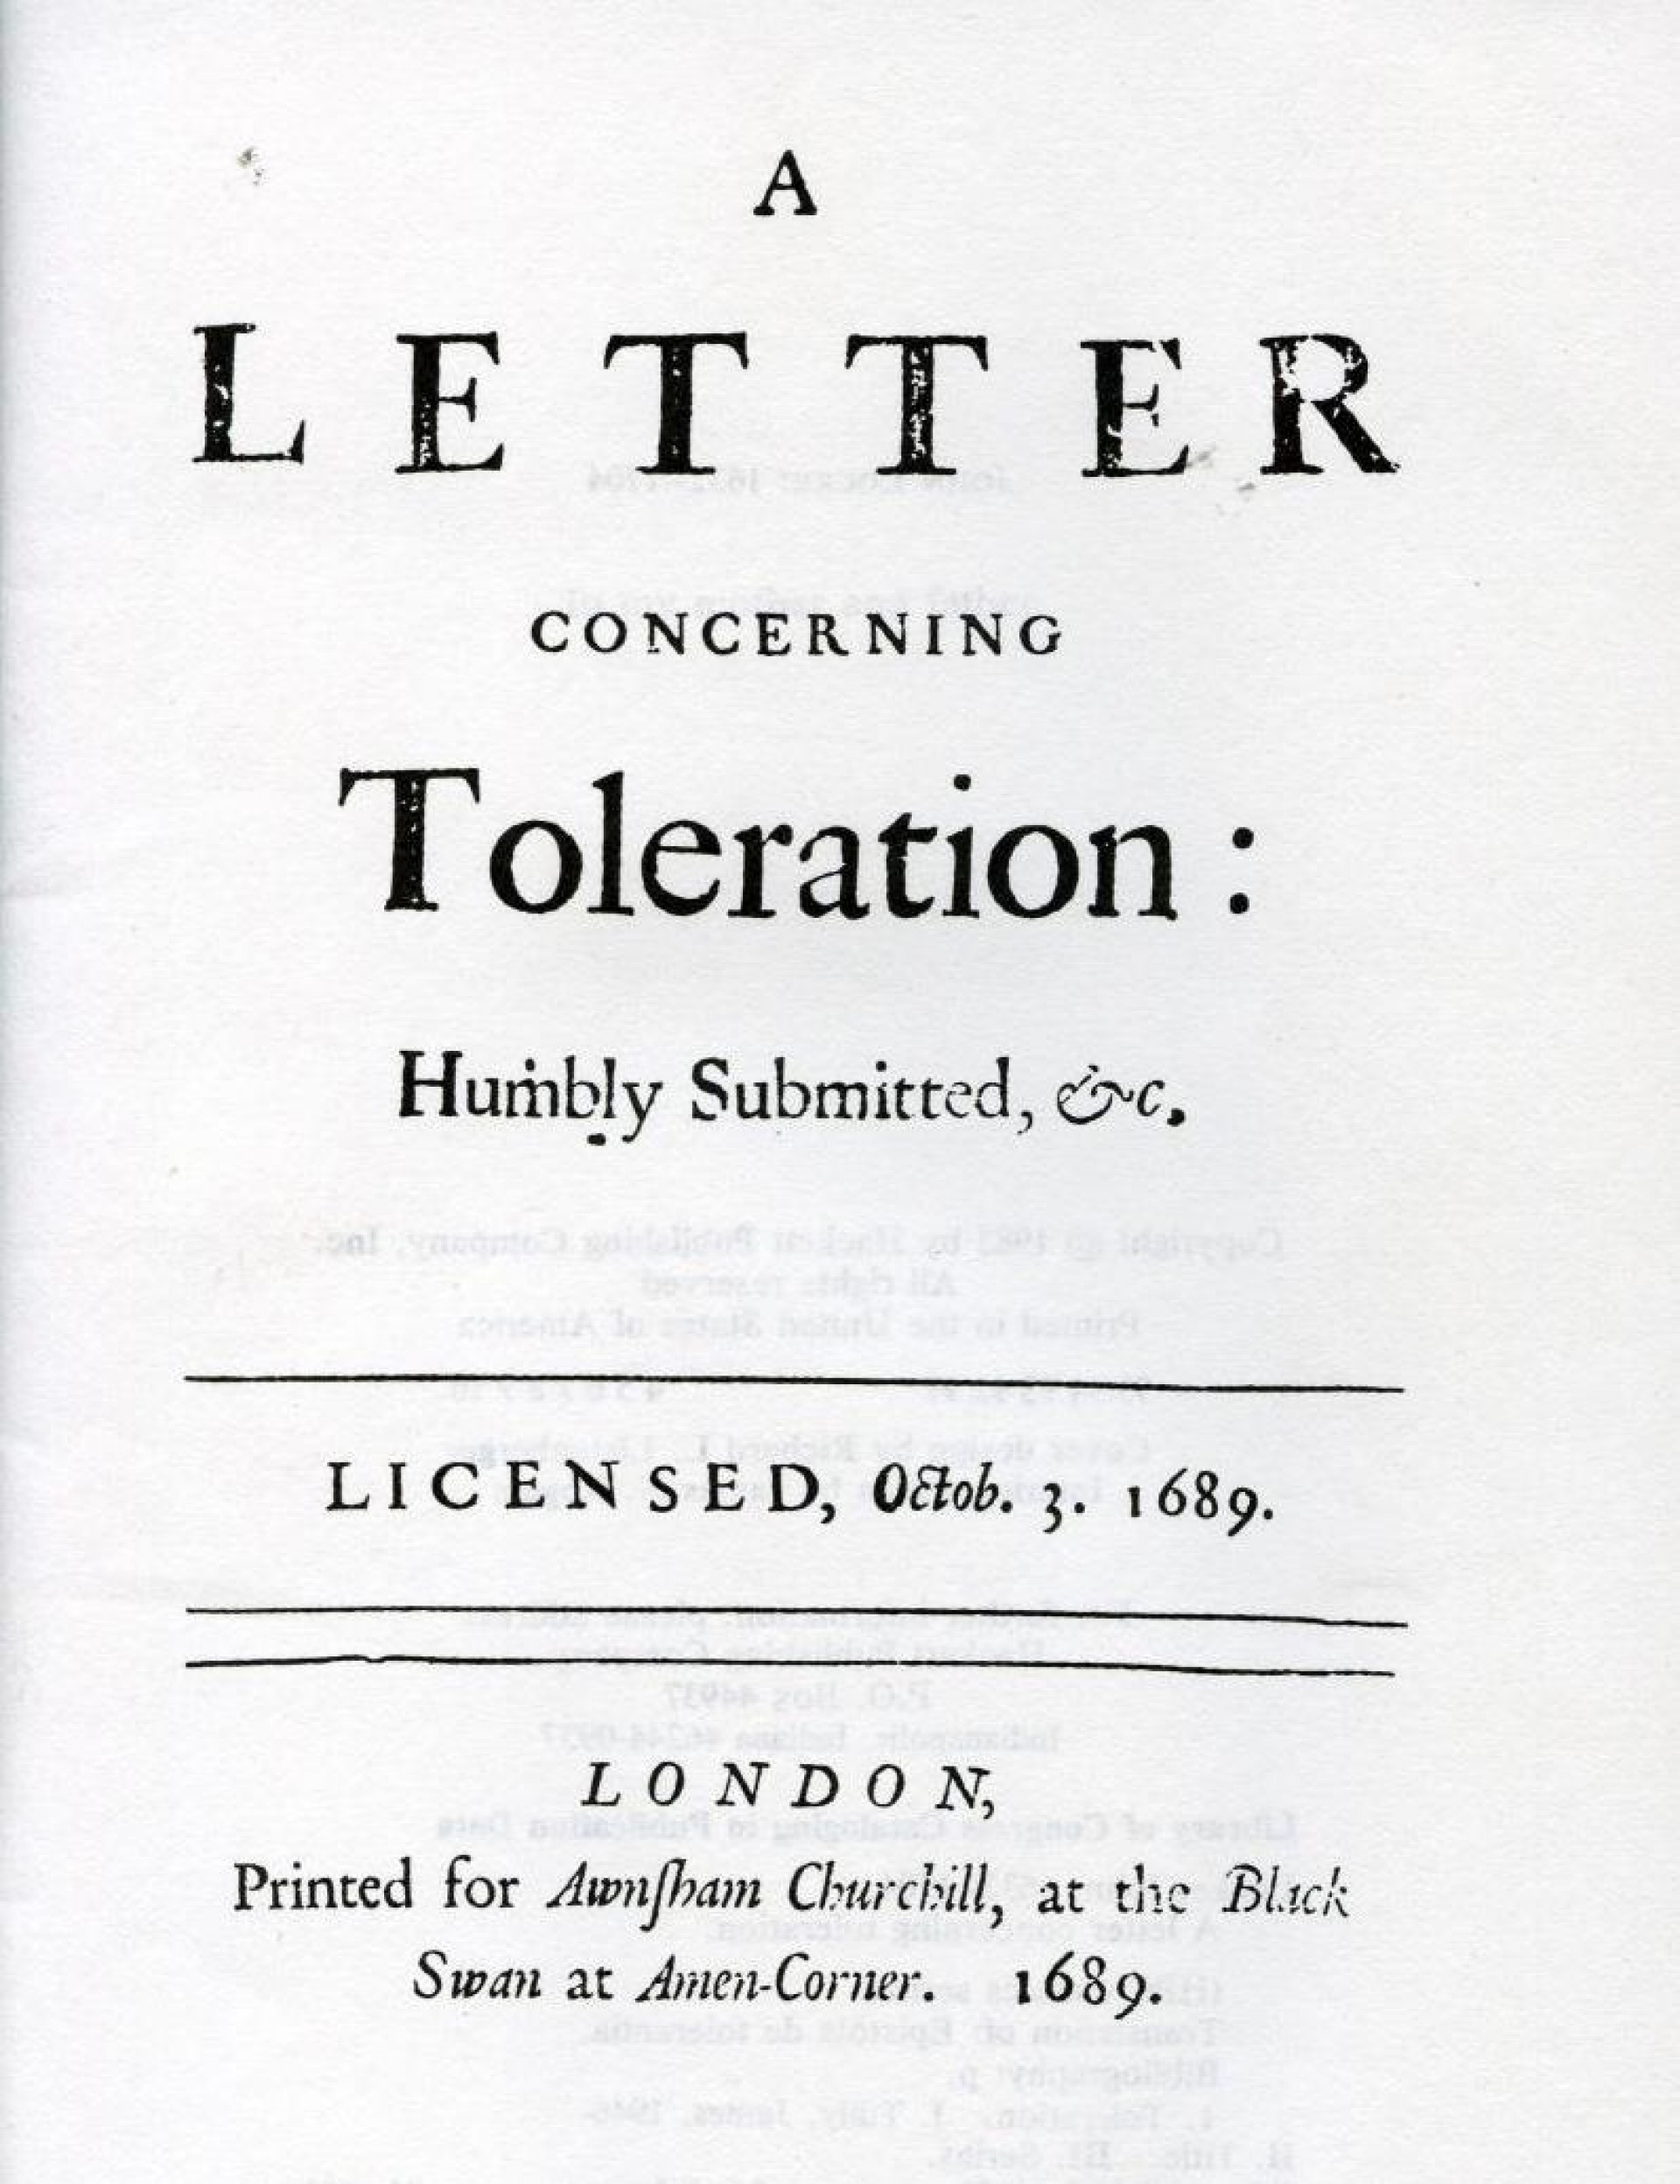 005 John Locke Essay Example Letter Concerning Toleration Impressive Human Understanding Book 4 On Pdf Summary 1920